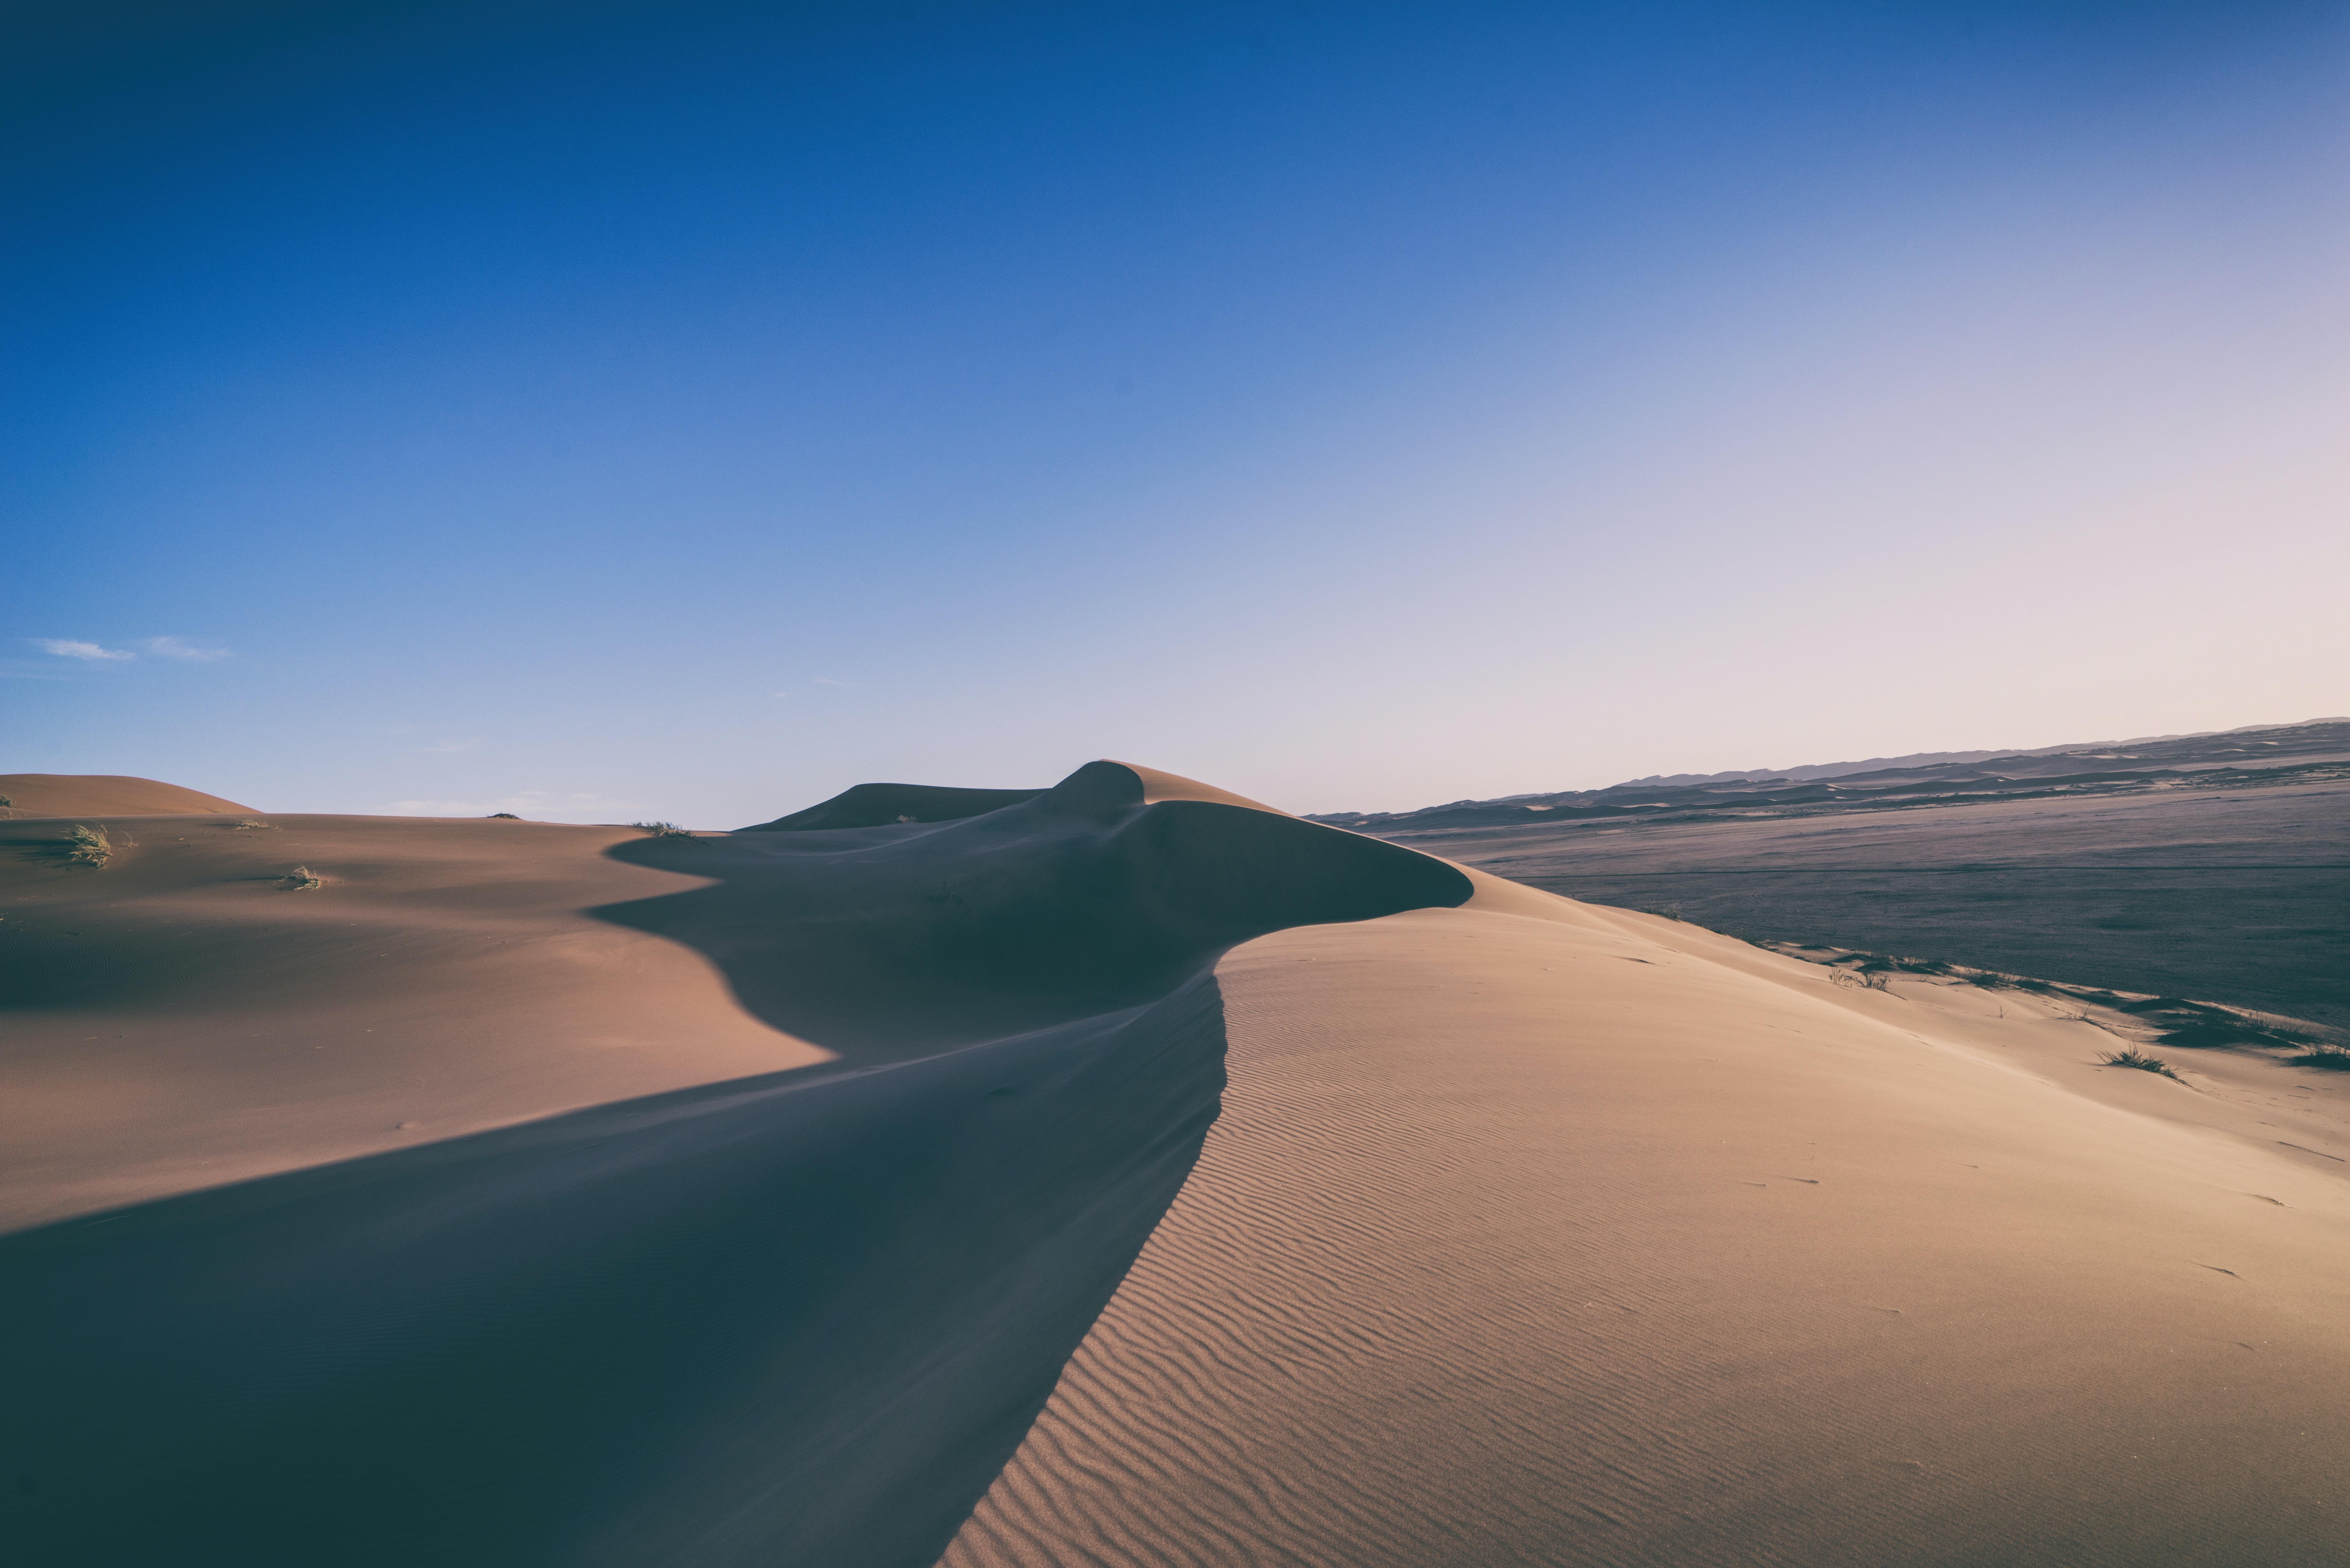 Ridge of a rippled sand ridge in the desert of Gobabeb